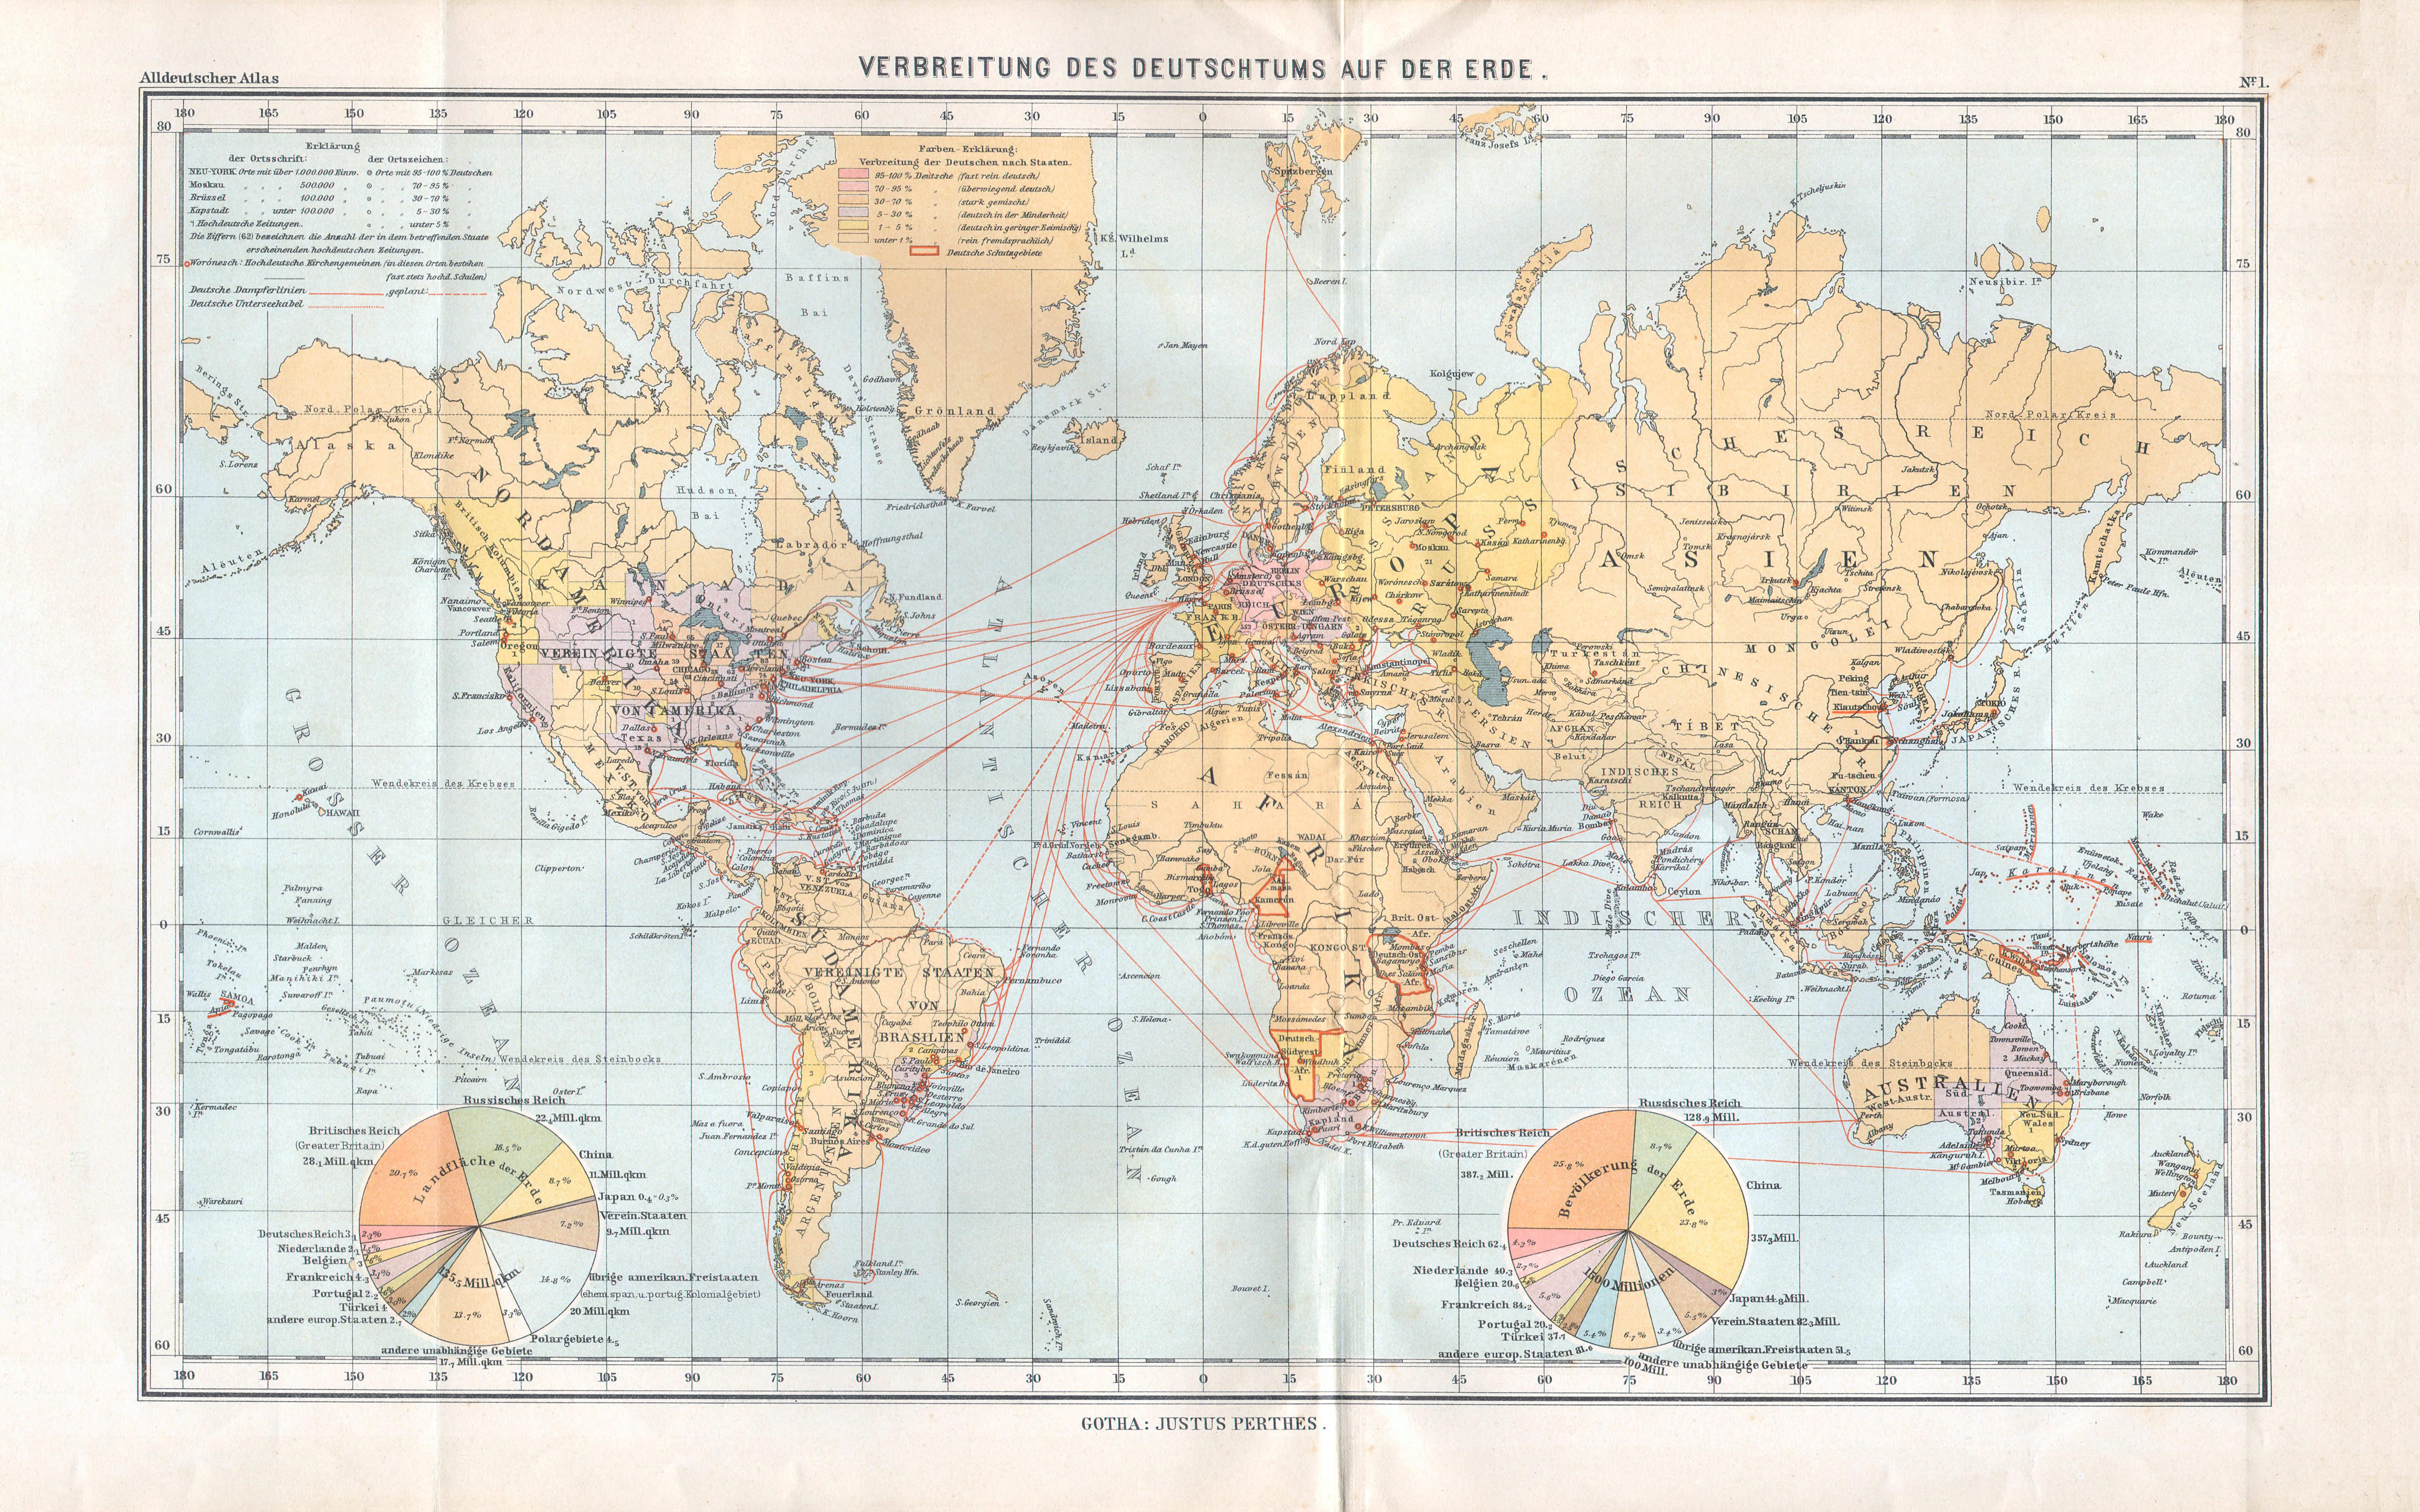 P perthes 39 alldeutscher atlas 2e druk 1903 - De thuisbasis van de wereld chesterfield ...